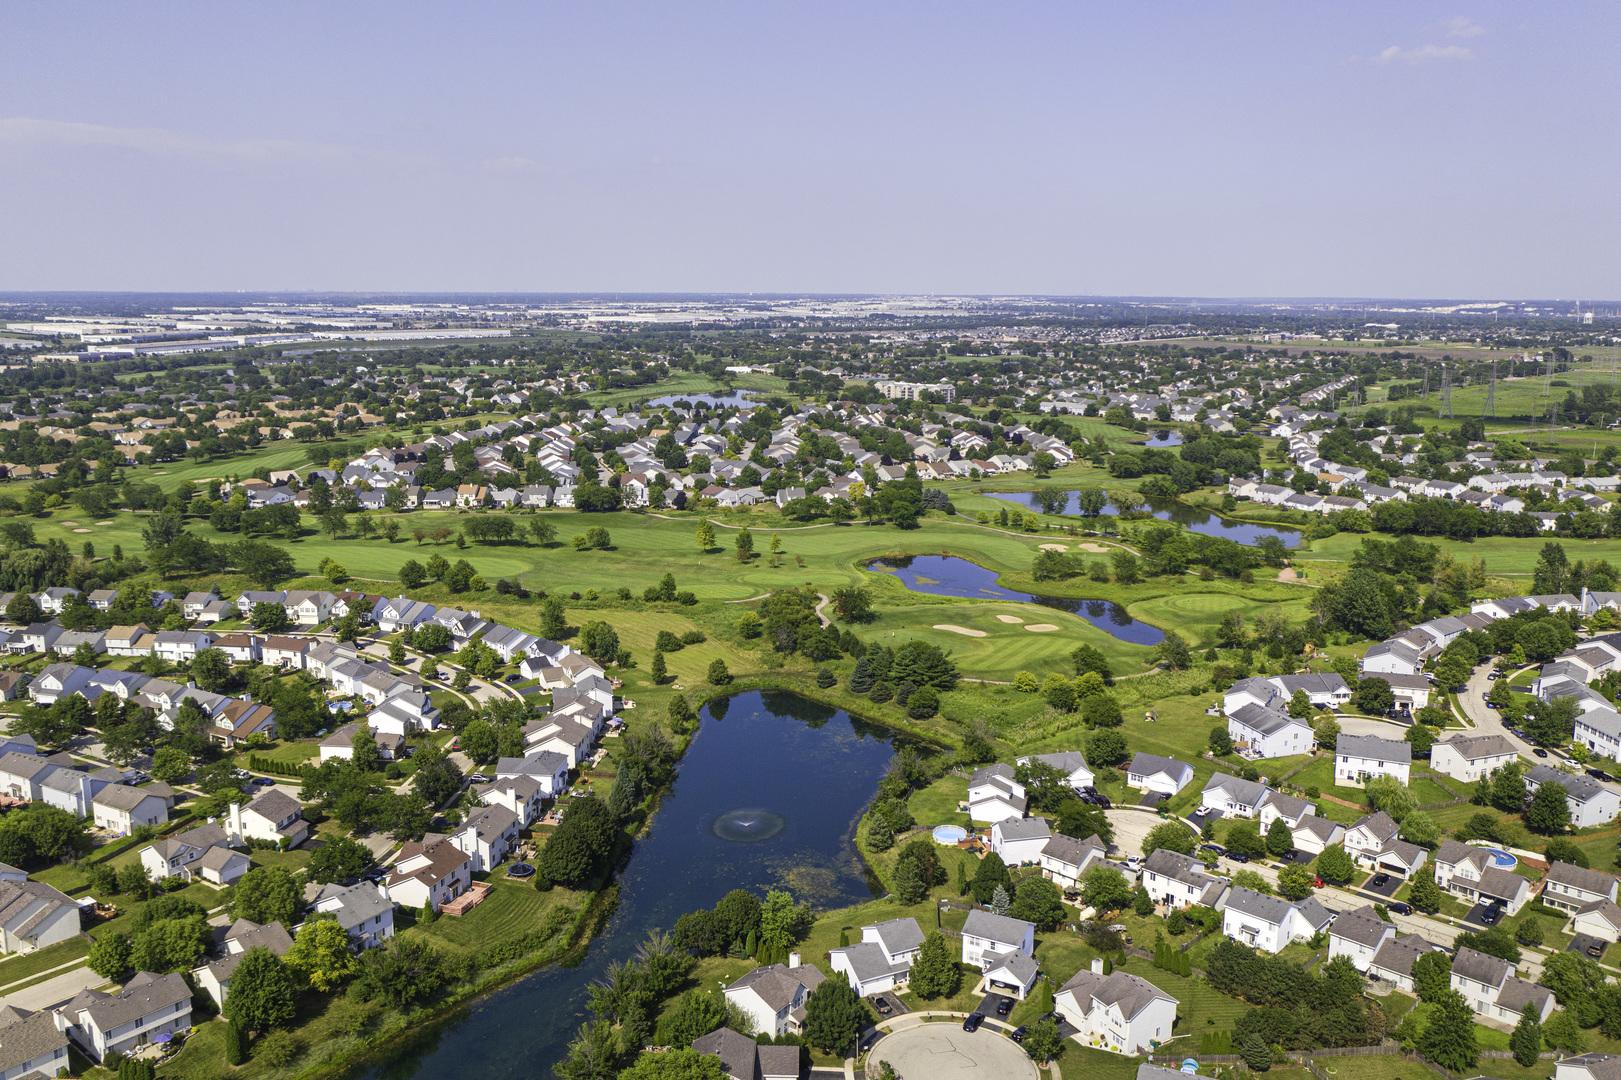 21721 W Hemingway, Plainfield, Illinois, 60544